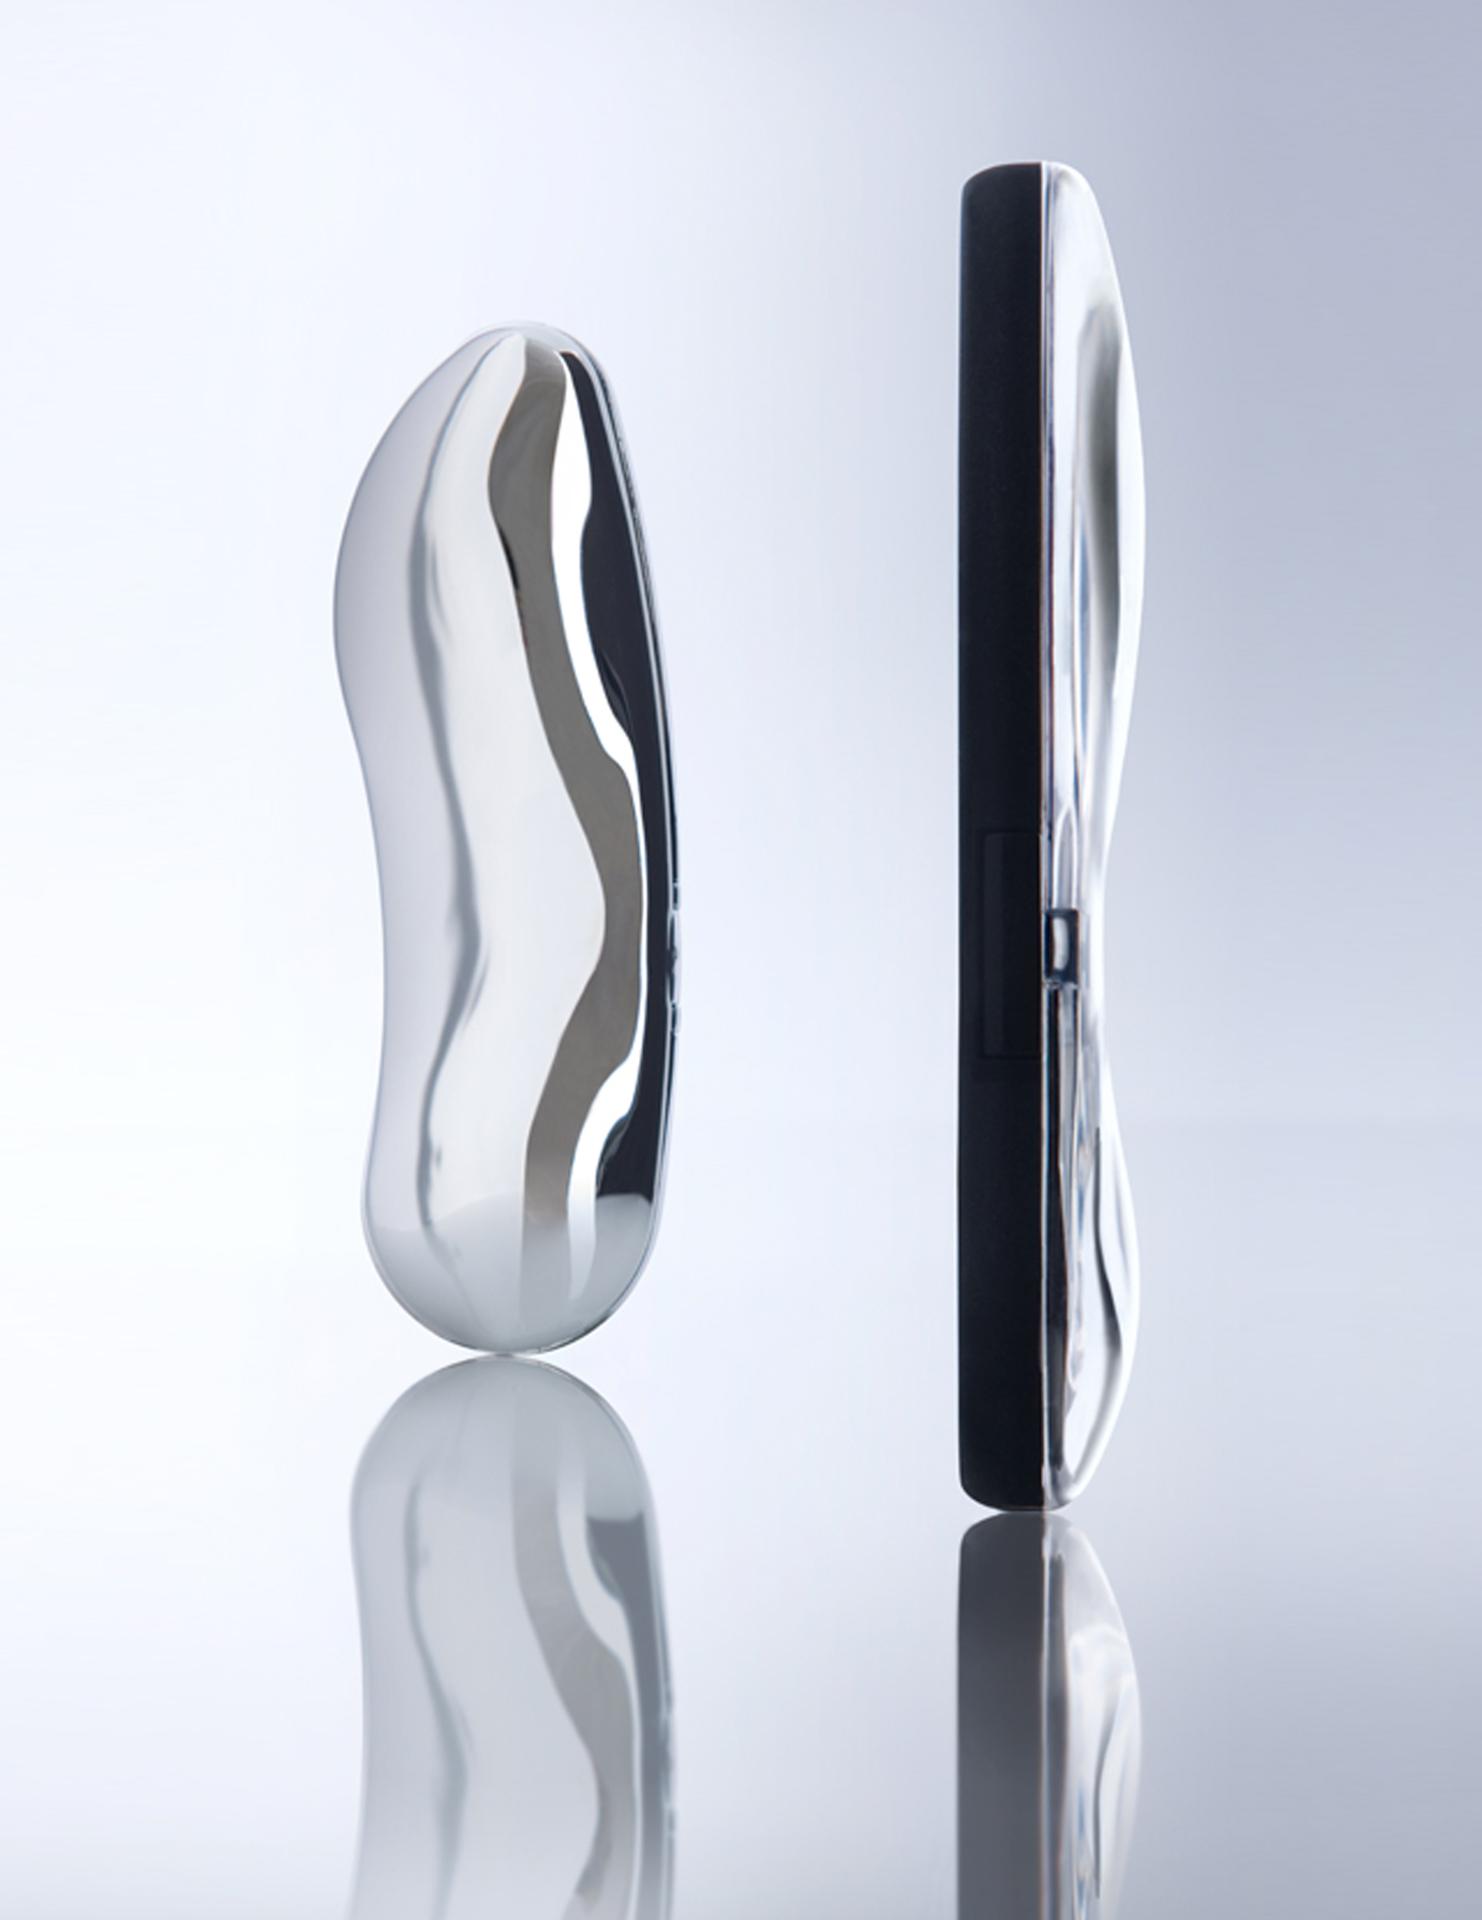 Beauty-tools_Deborah-Milano_Mario-Trimarchi-Design-Ph Santi Caleca